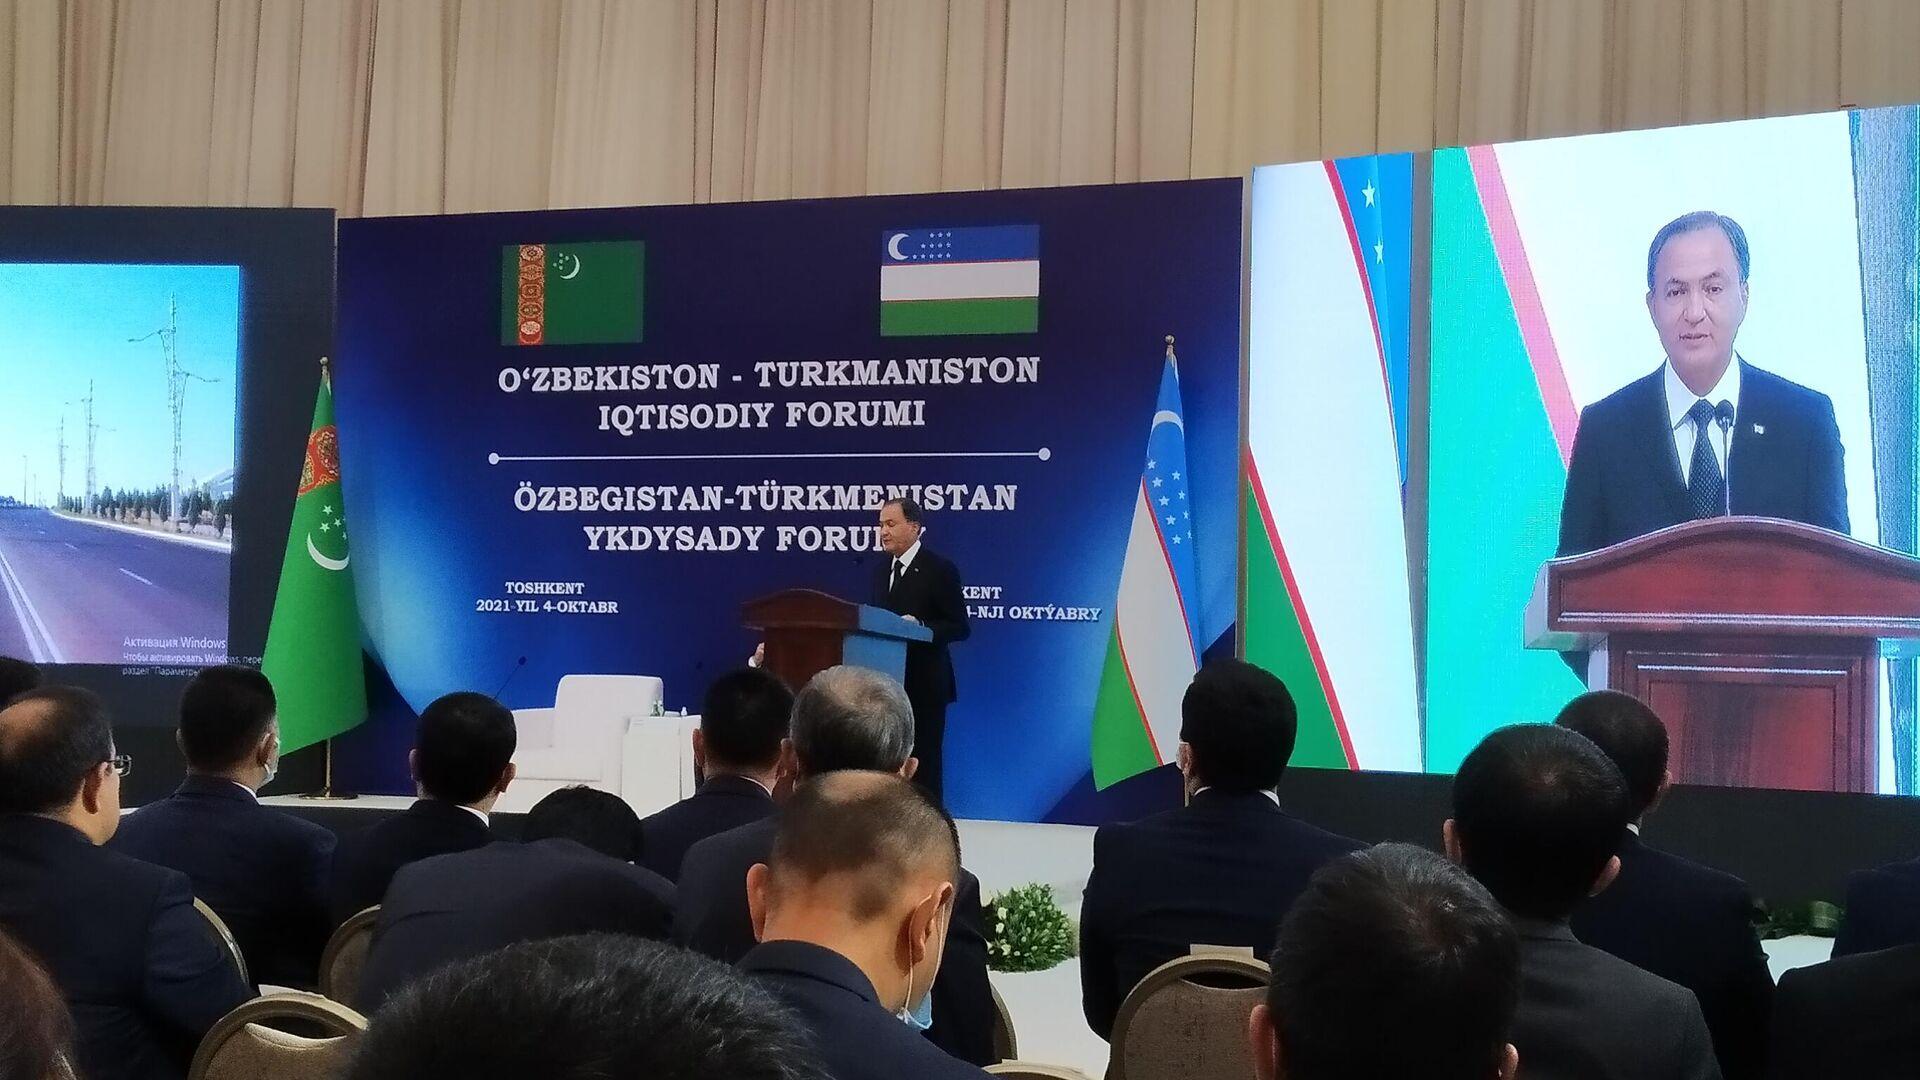 Узбекско-туркменский форум в Ташкенте - Sputnik Узбекистан, 1920, 04.10.2021